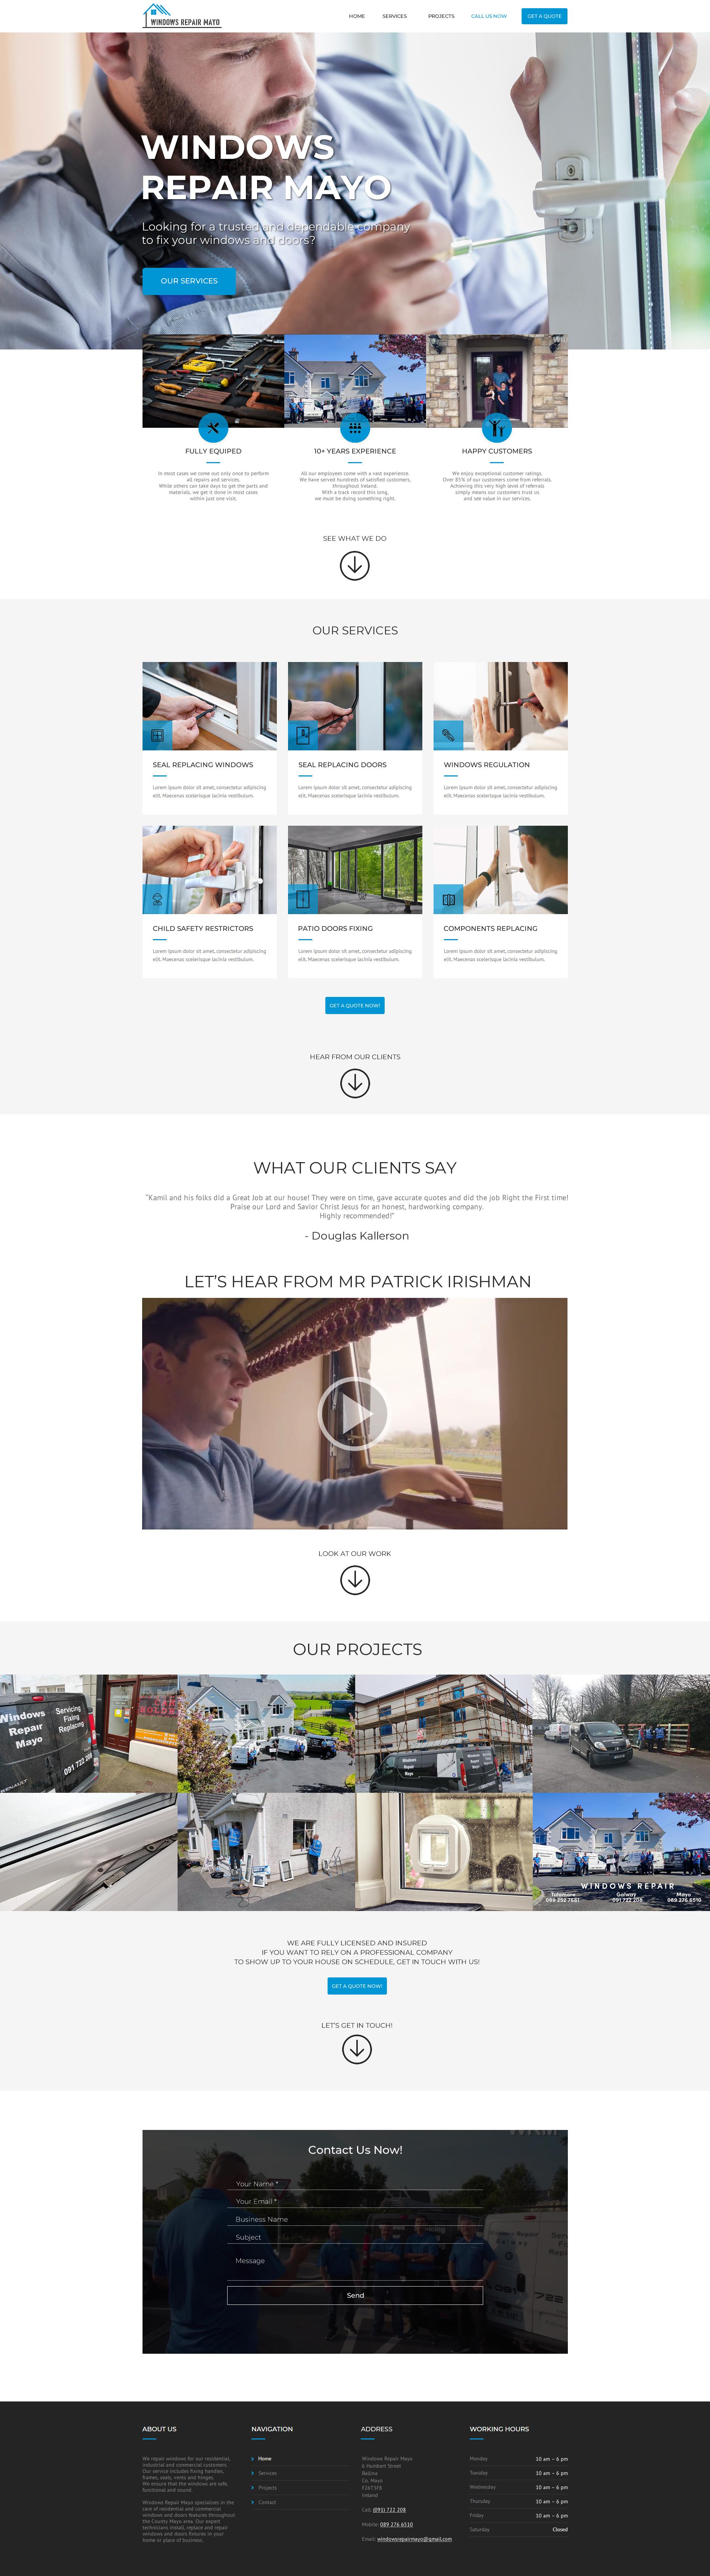 Windows Repair Mayo website developed by DigitalLab Web Design Agency Dublin